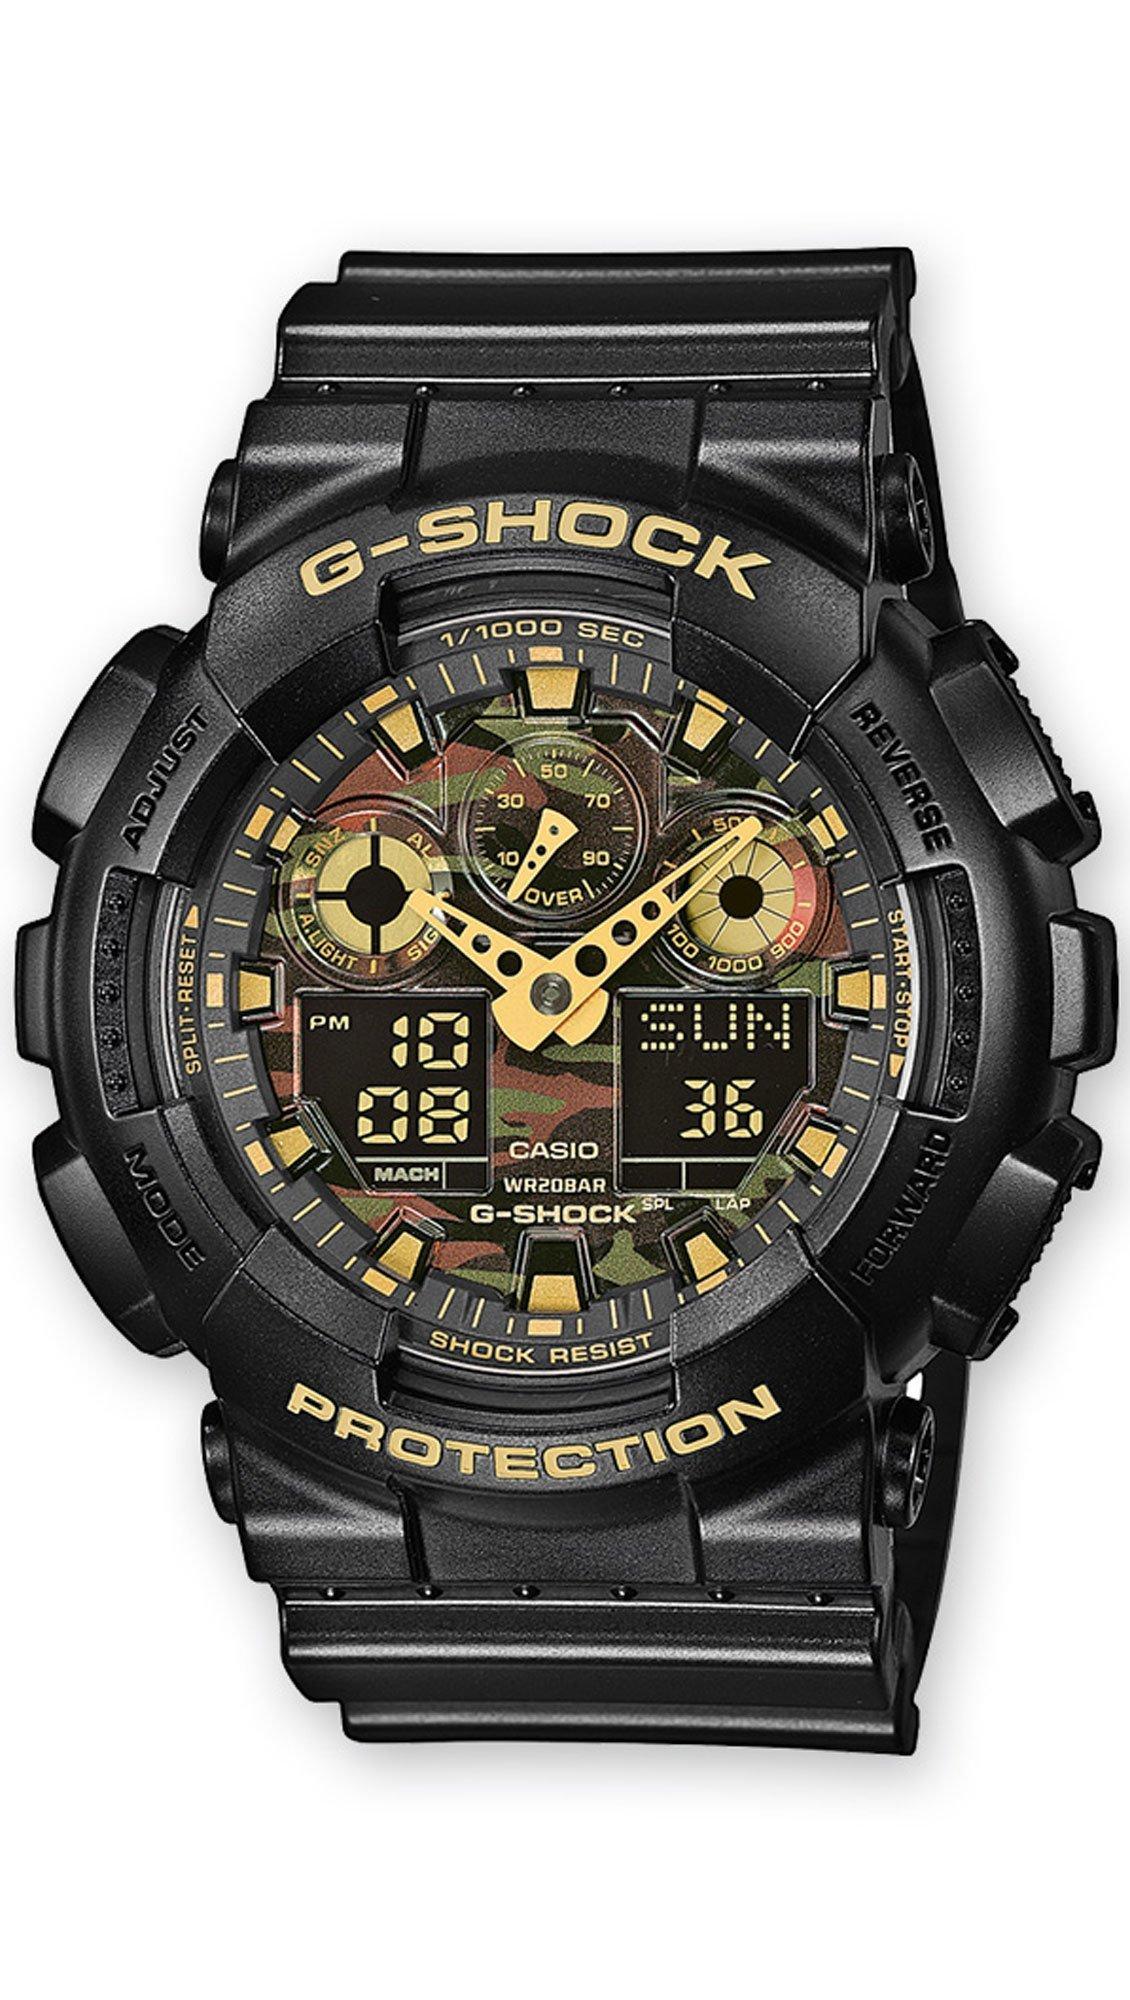 CASIO G-Shock - GA-100CF-1A9ER Black case, with Black Rubber Strap